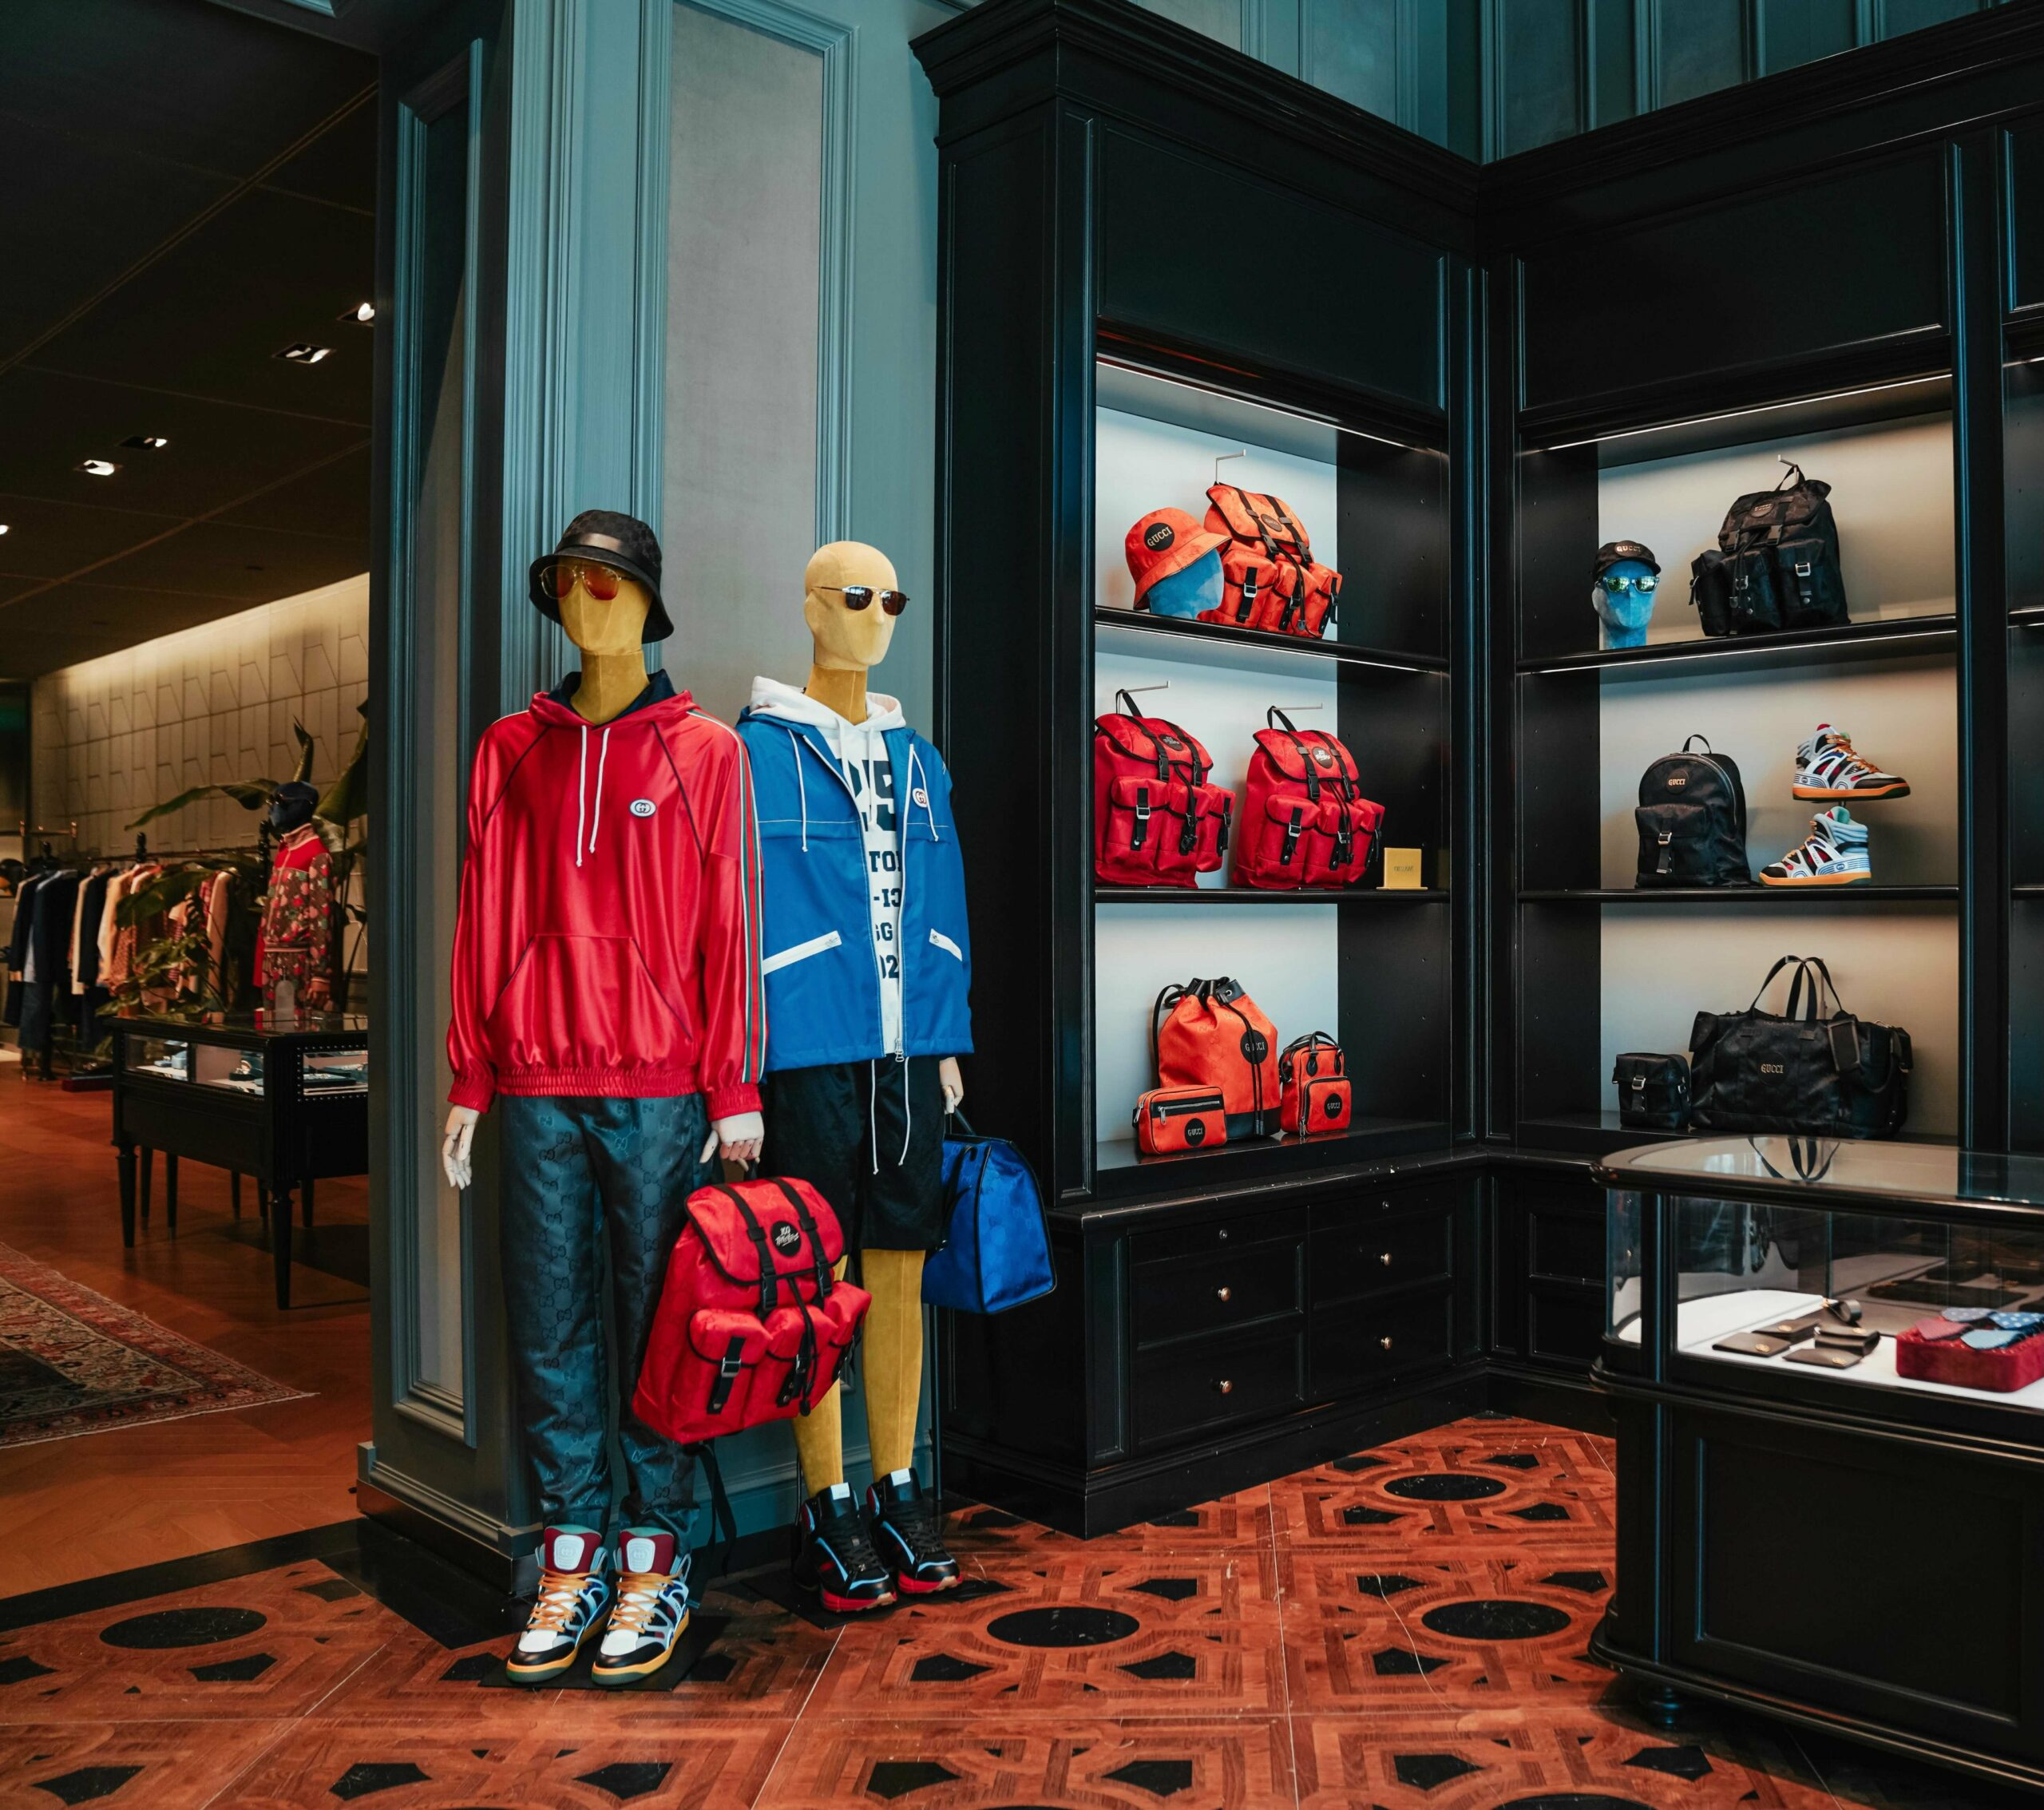 Esports organization 100thieves collab with fashion brand Gucci